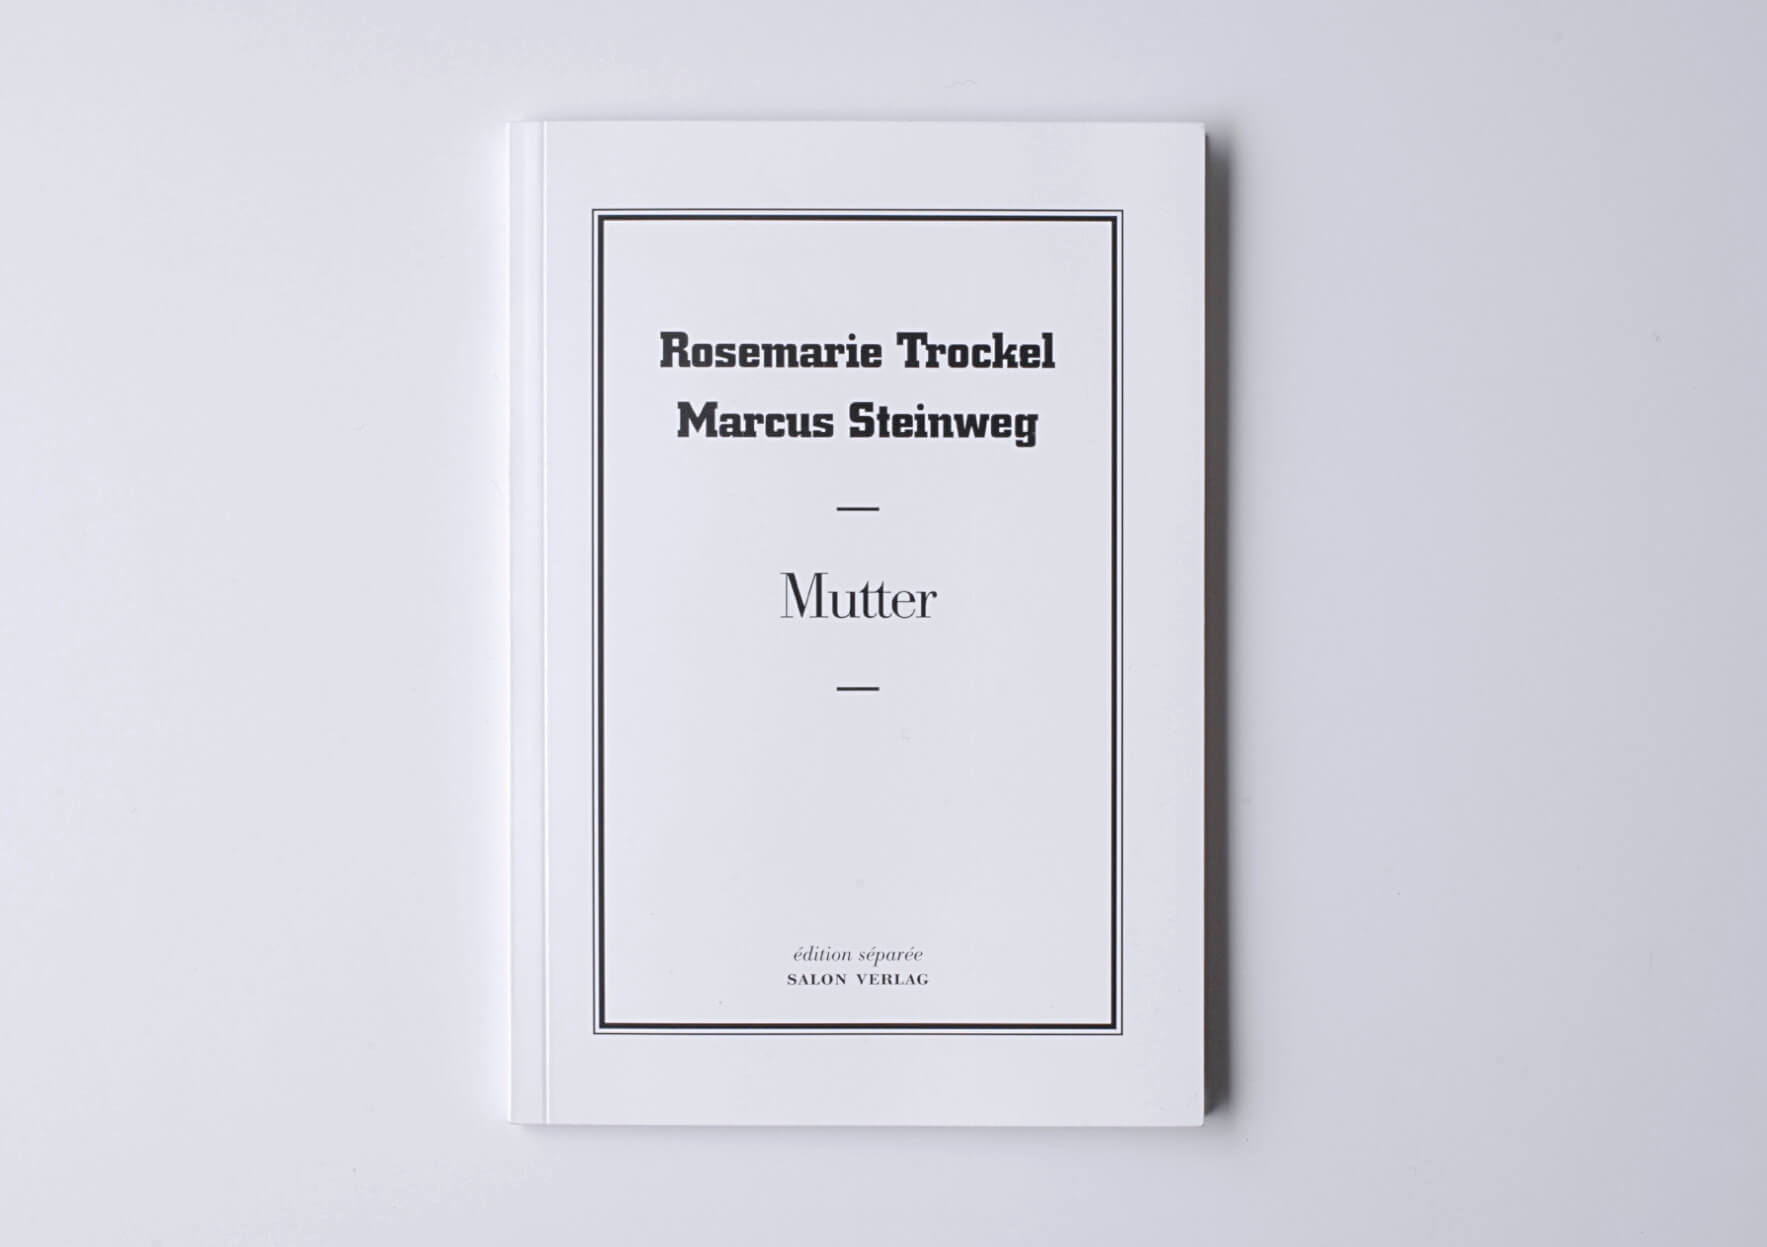 Rosemarie Trockel, Marcus Steinweg Mutter, 2007 11,5 x 17 cm, 32p. Ed.1000 Ed. Reiner Speck und Gerhard Theewen | Mother | ProjecteSD